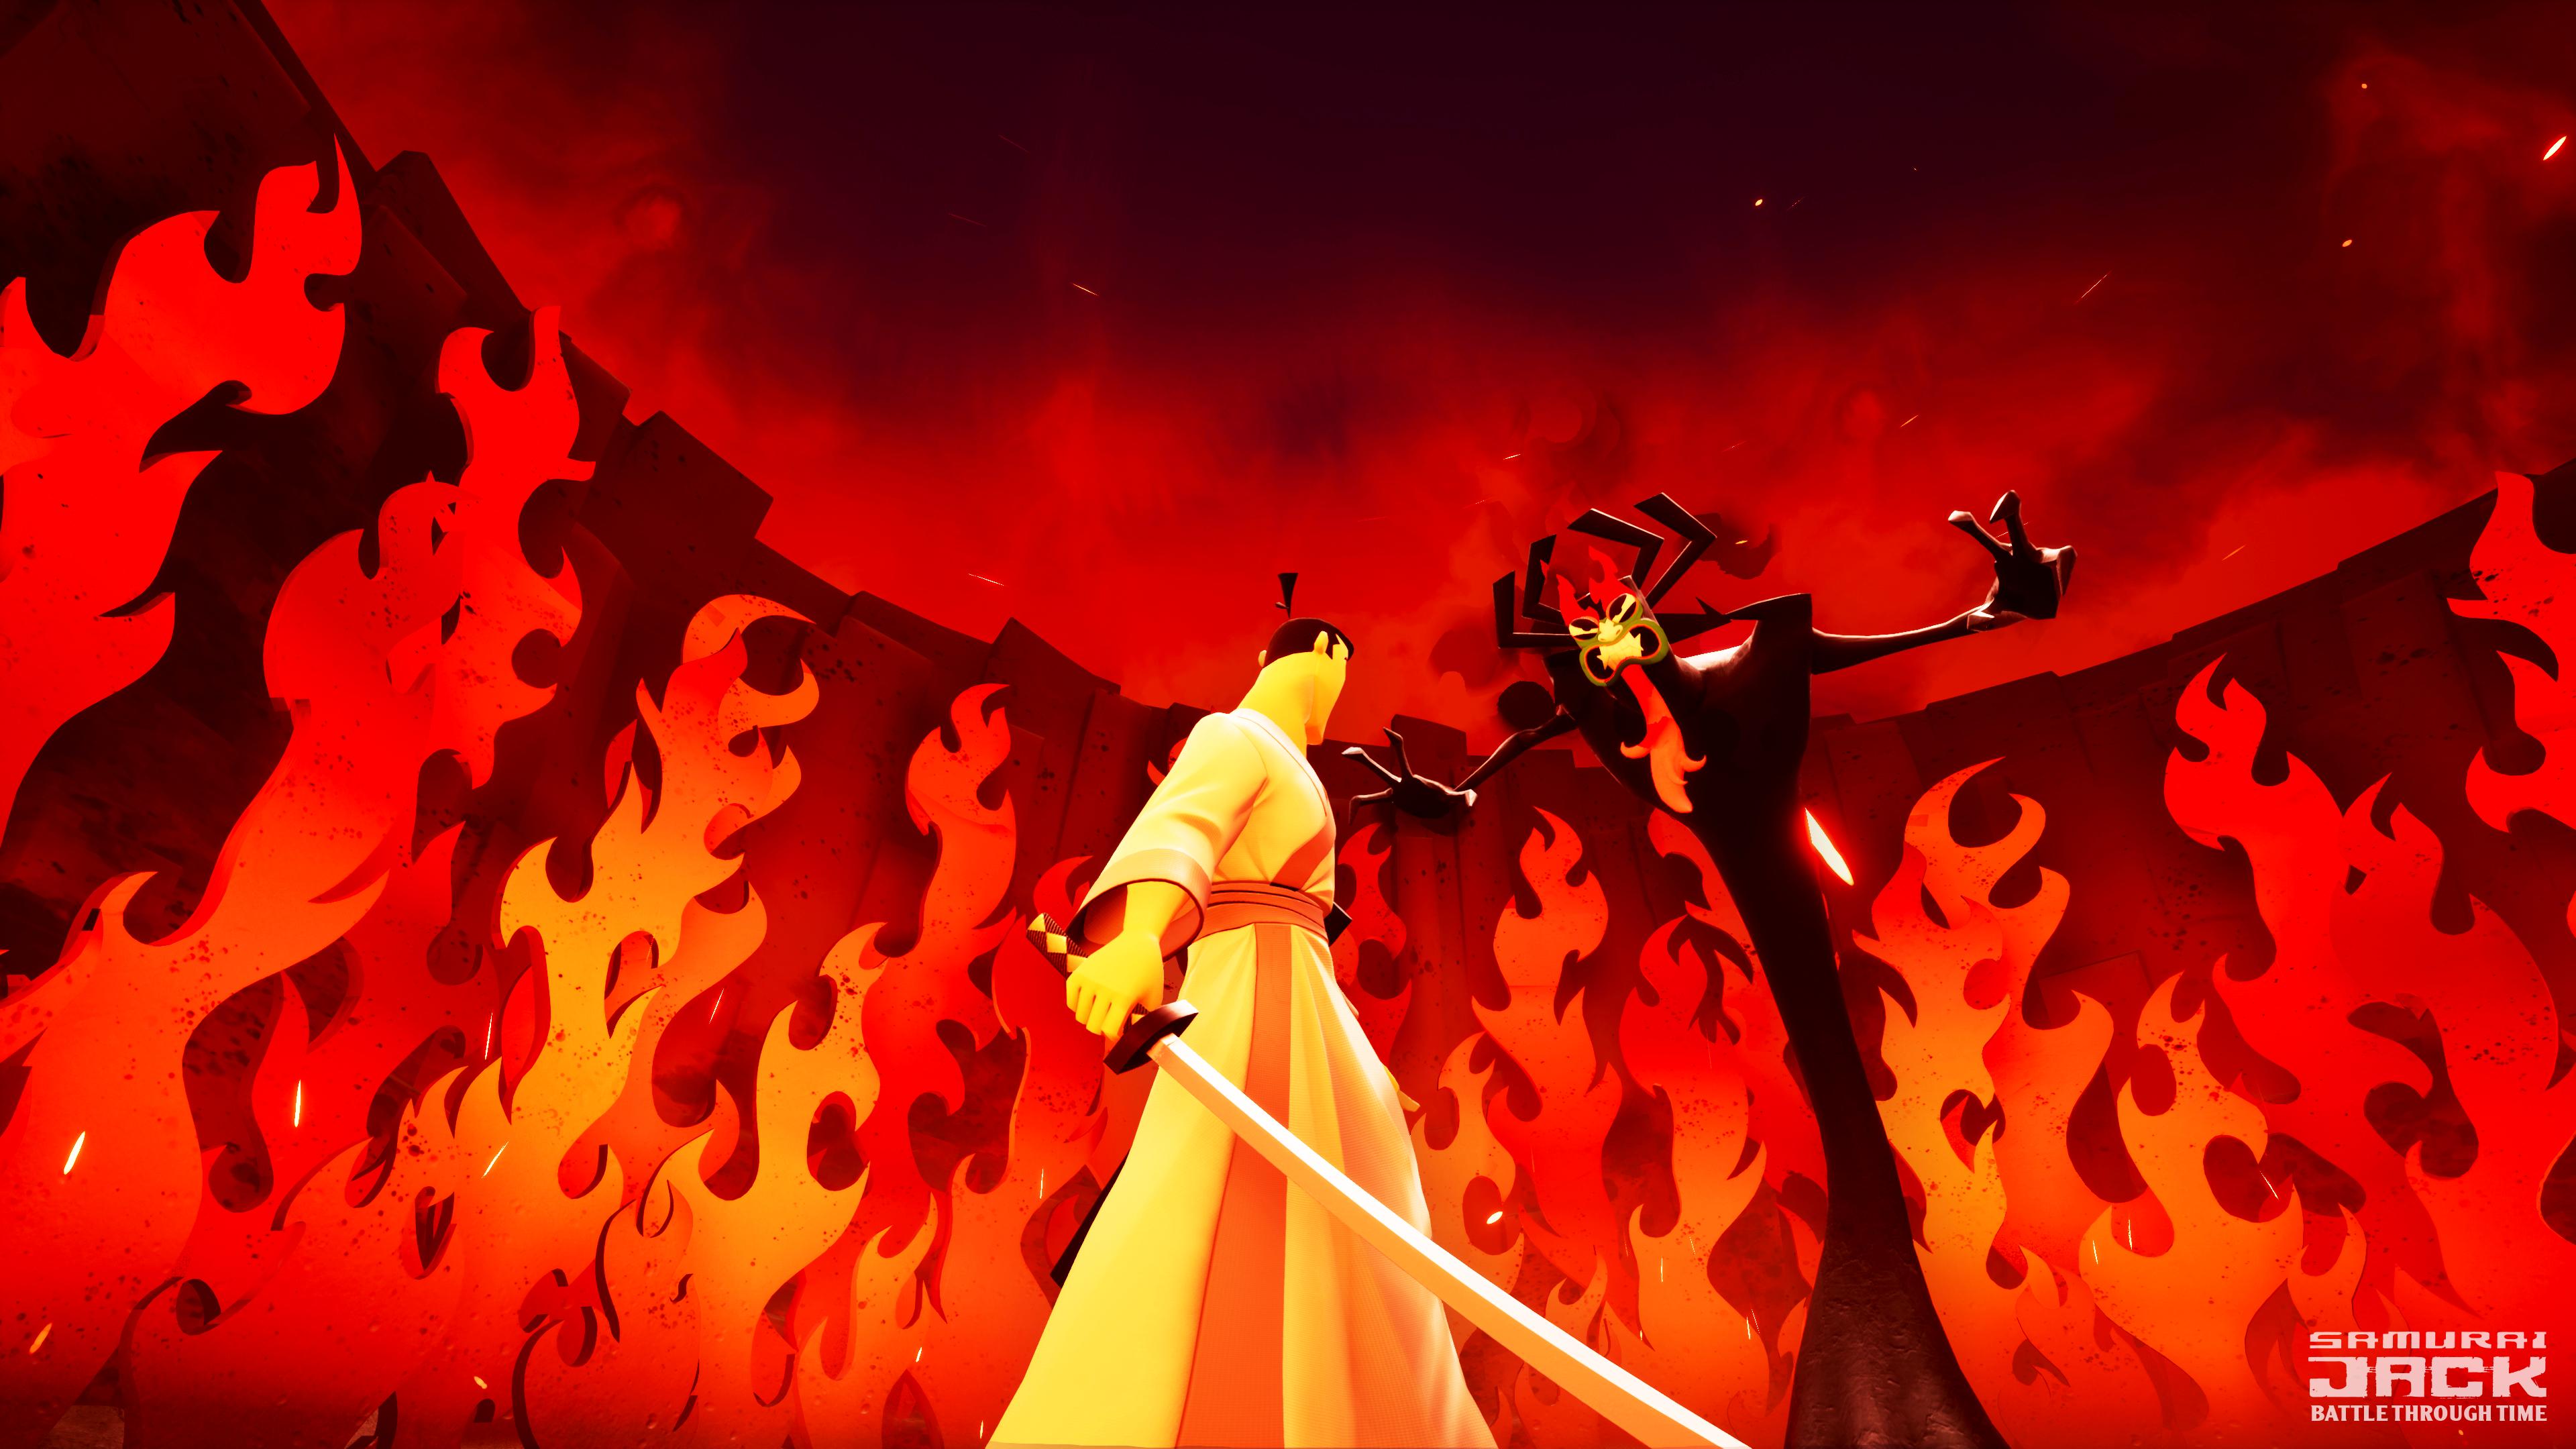 Samurai Jack: Battle Through Time - final battle?